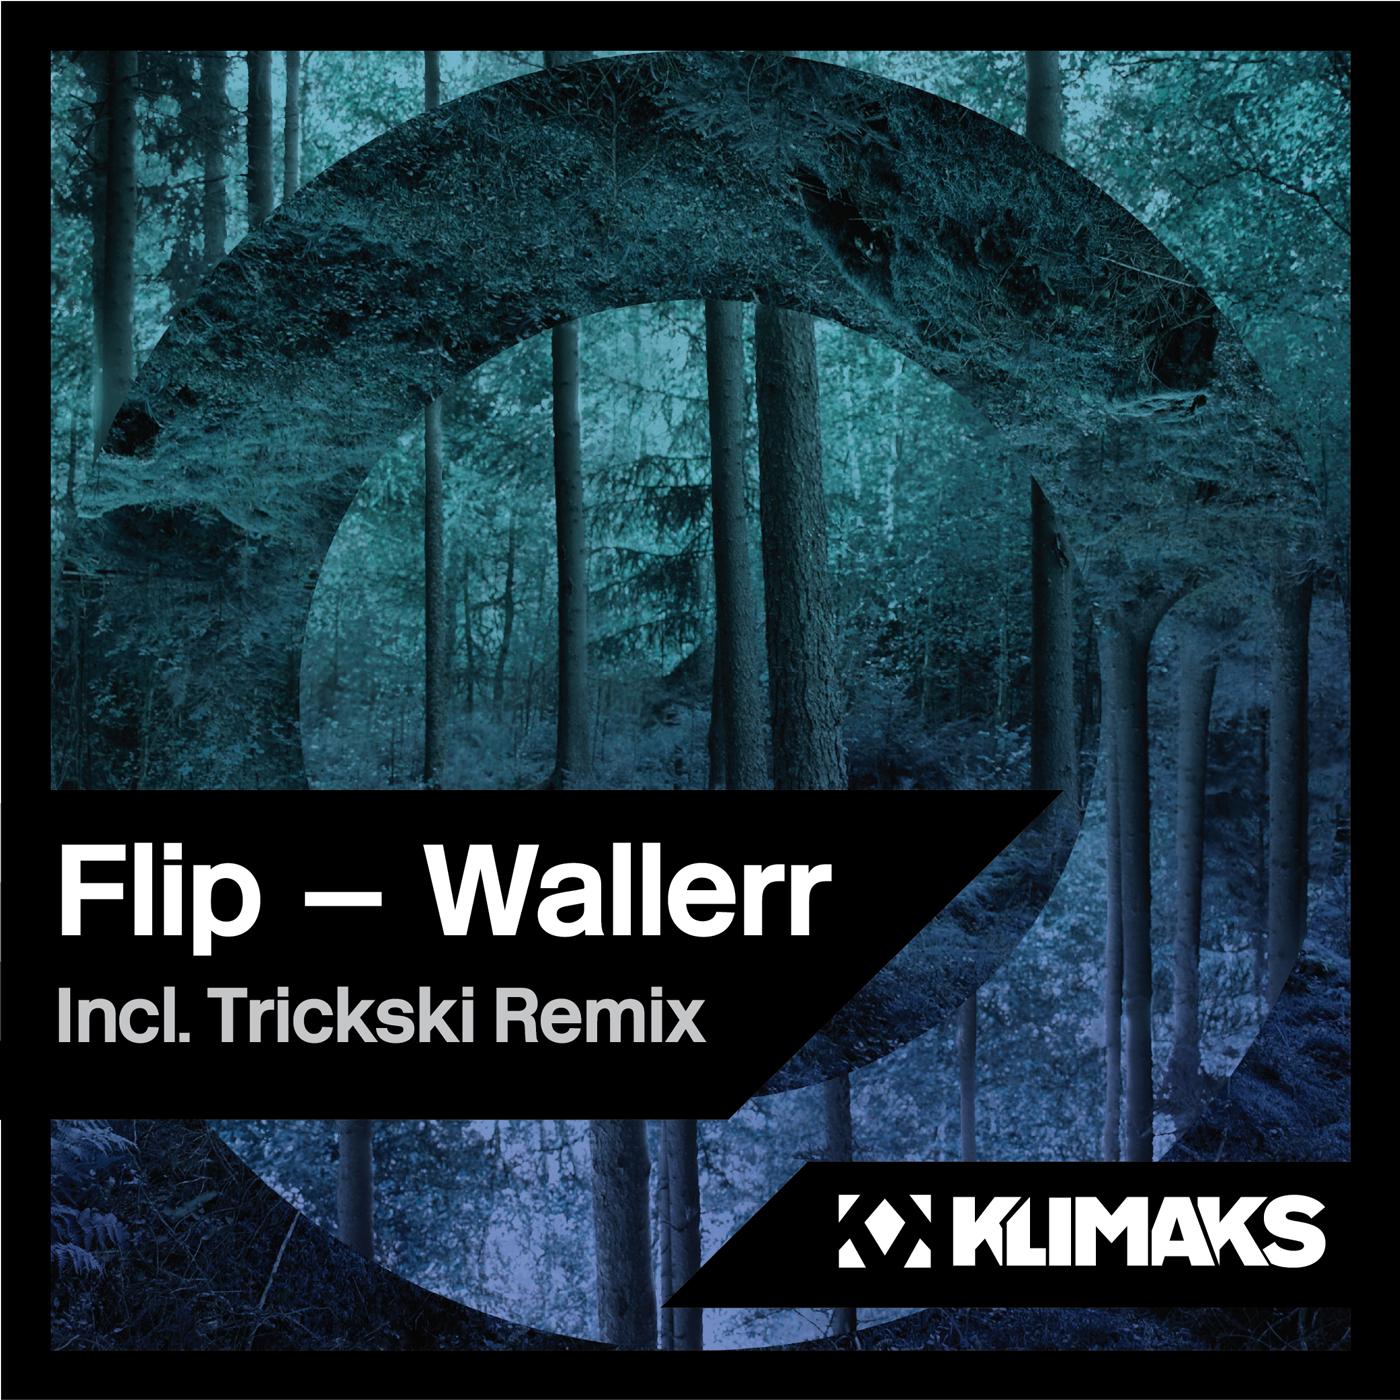 Flip wallerr trickski remix original preview top for House music remix